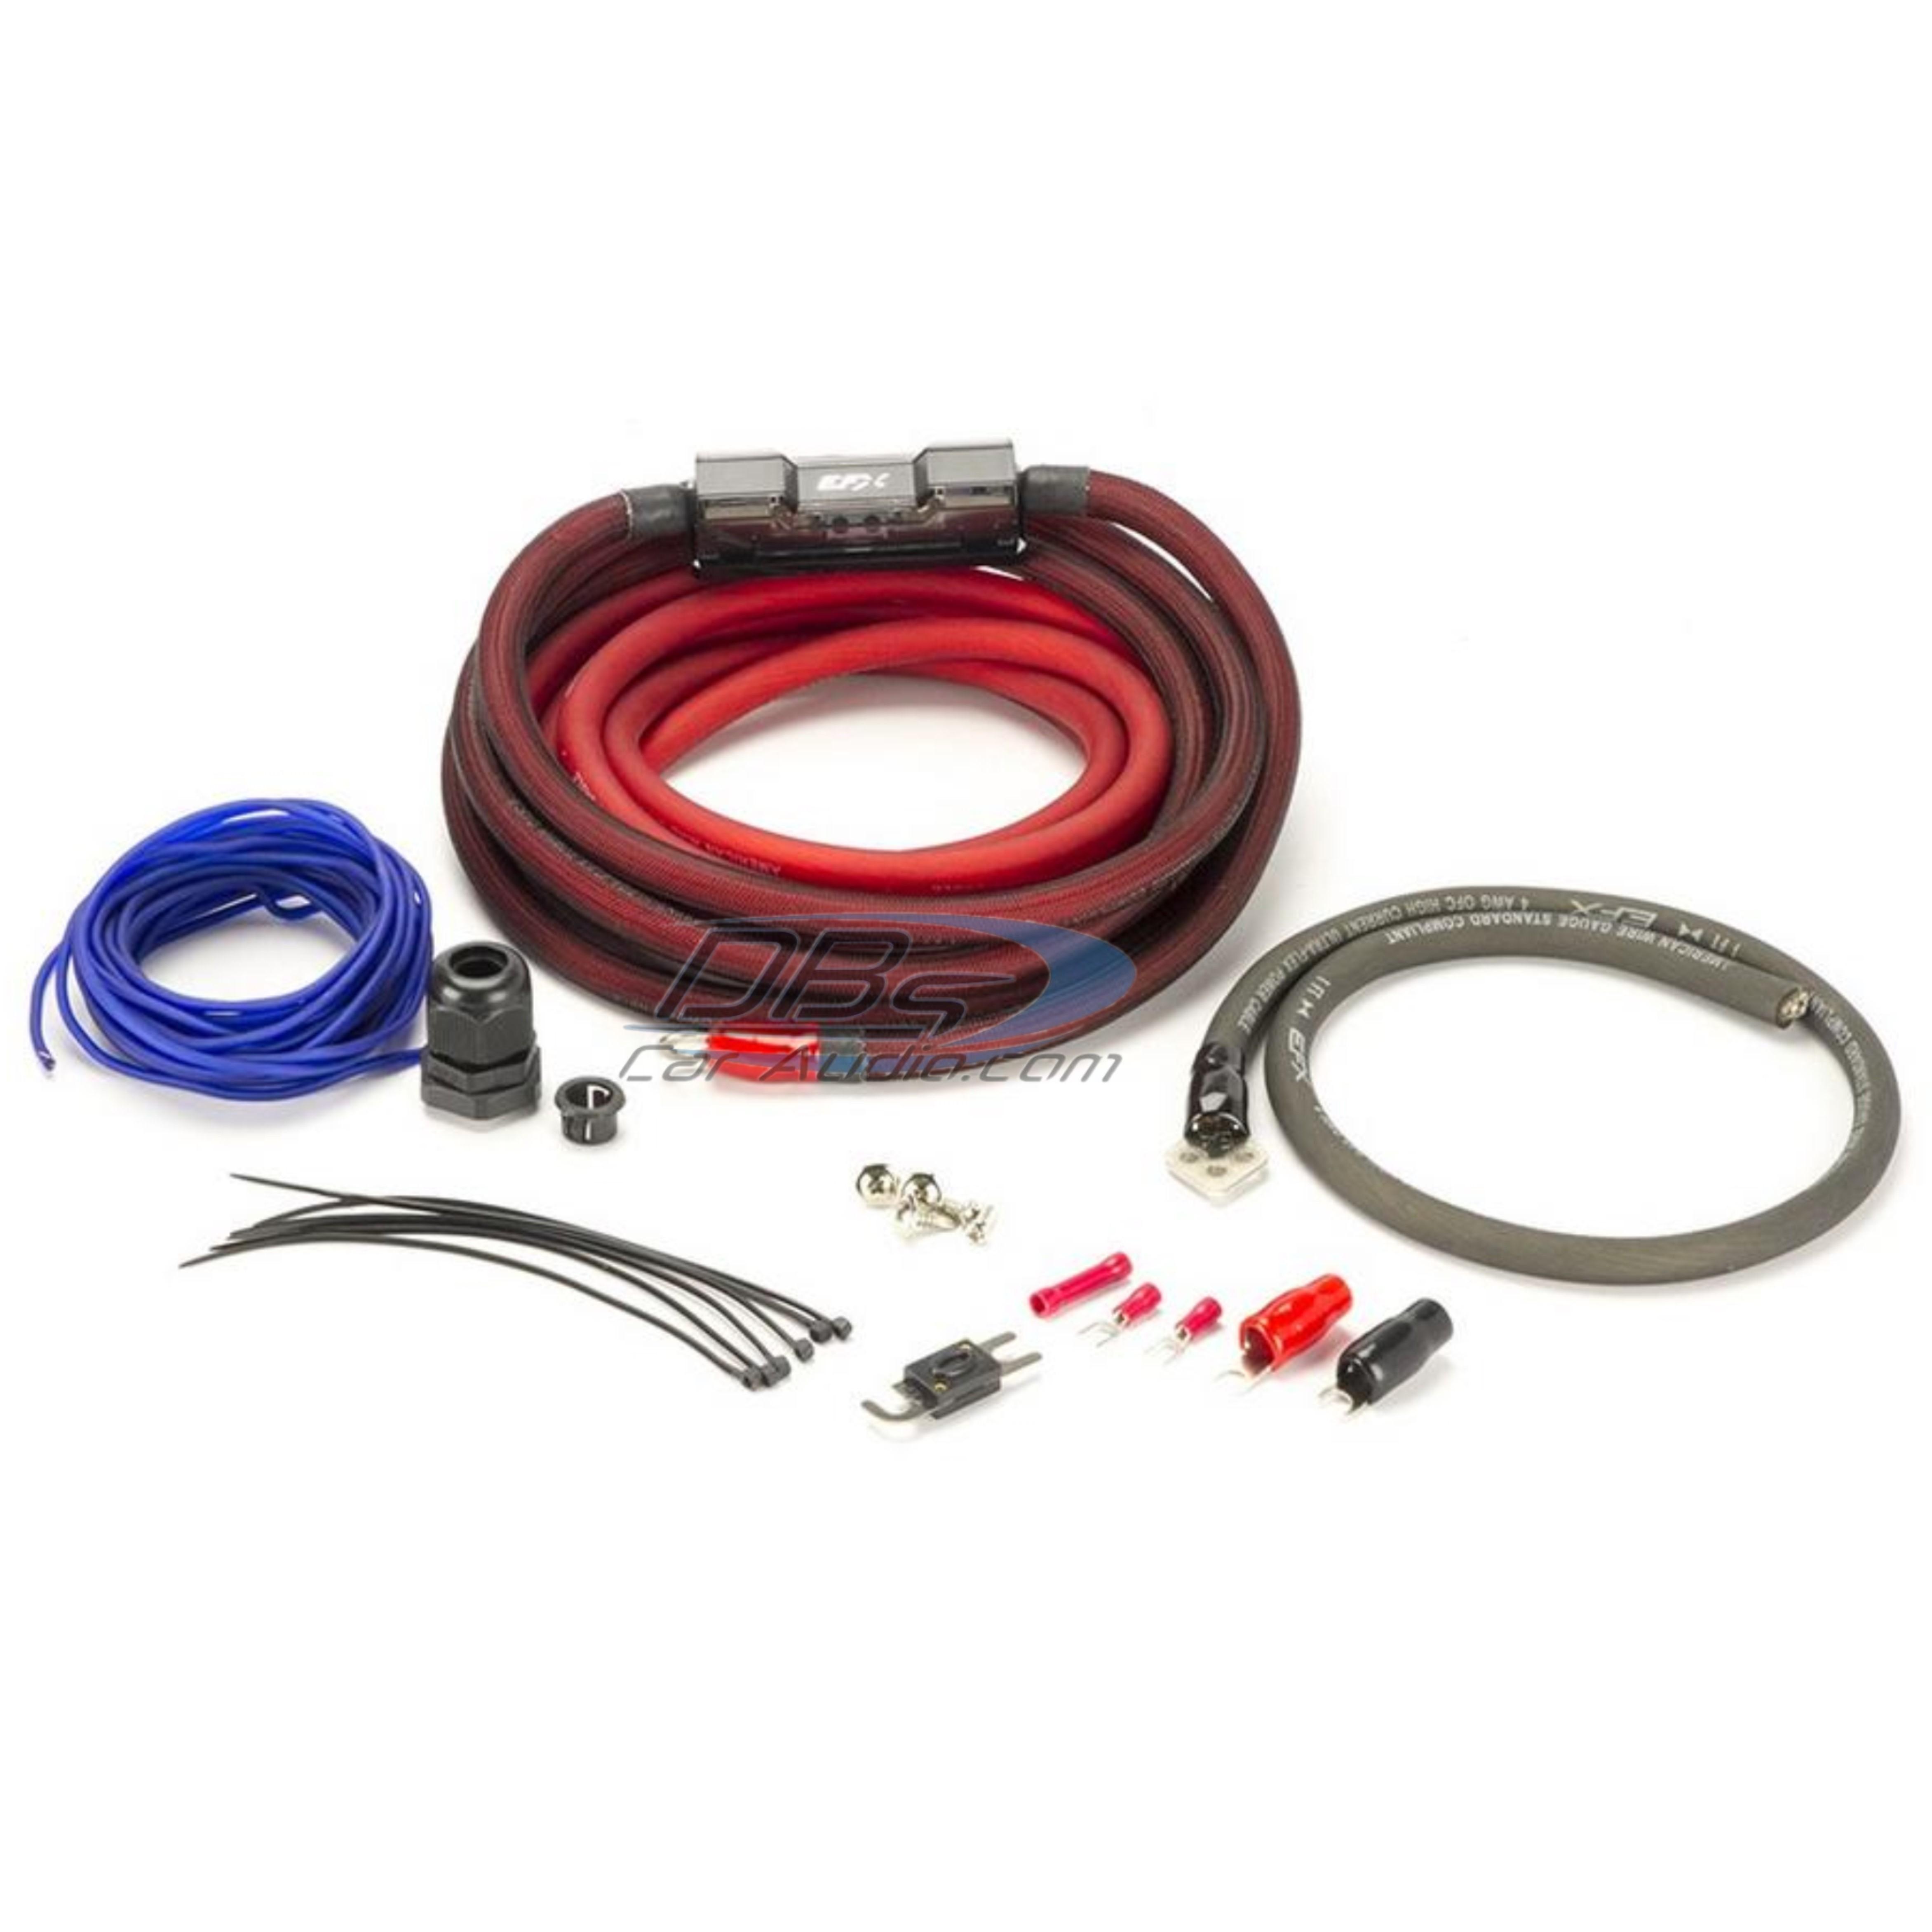 Car Audio Wiring Kit Philippines Amplifier Diagramrhwiringdiagram